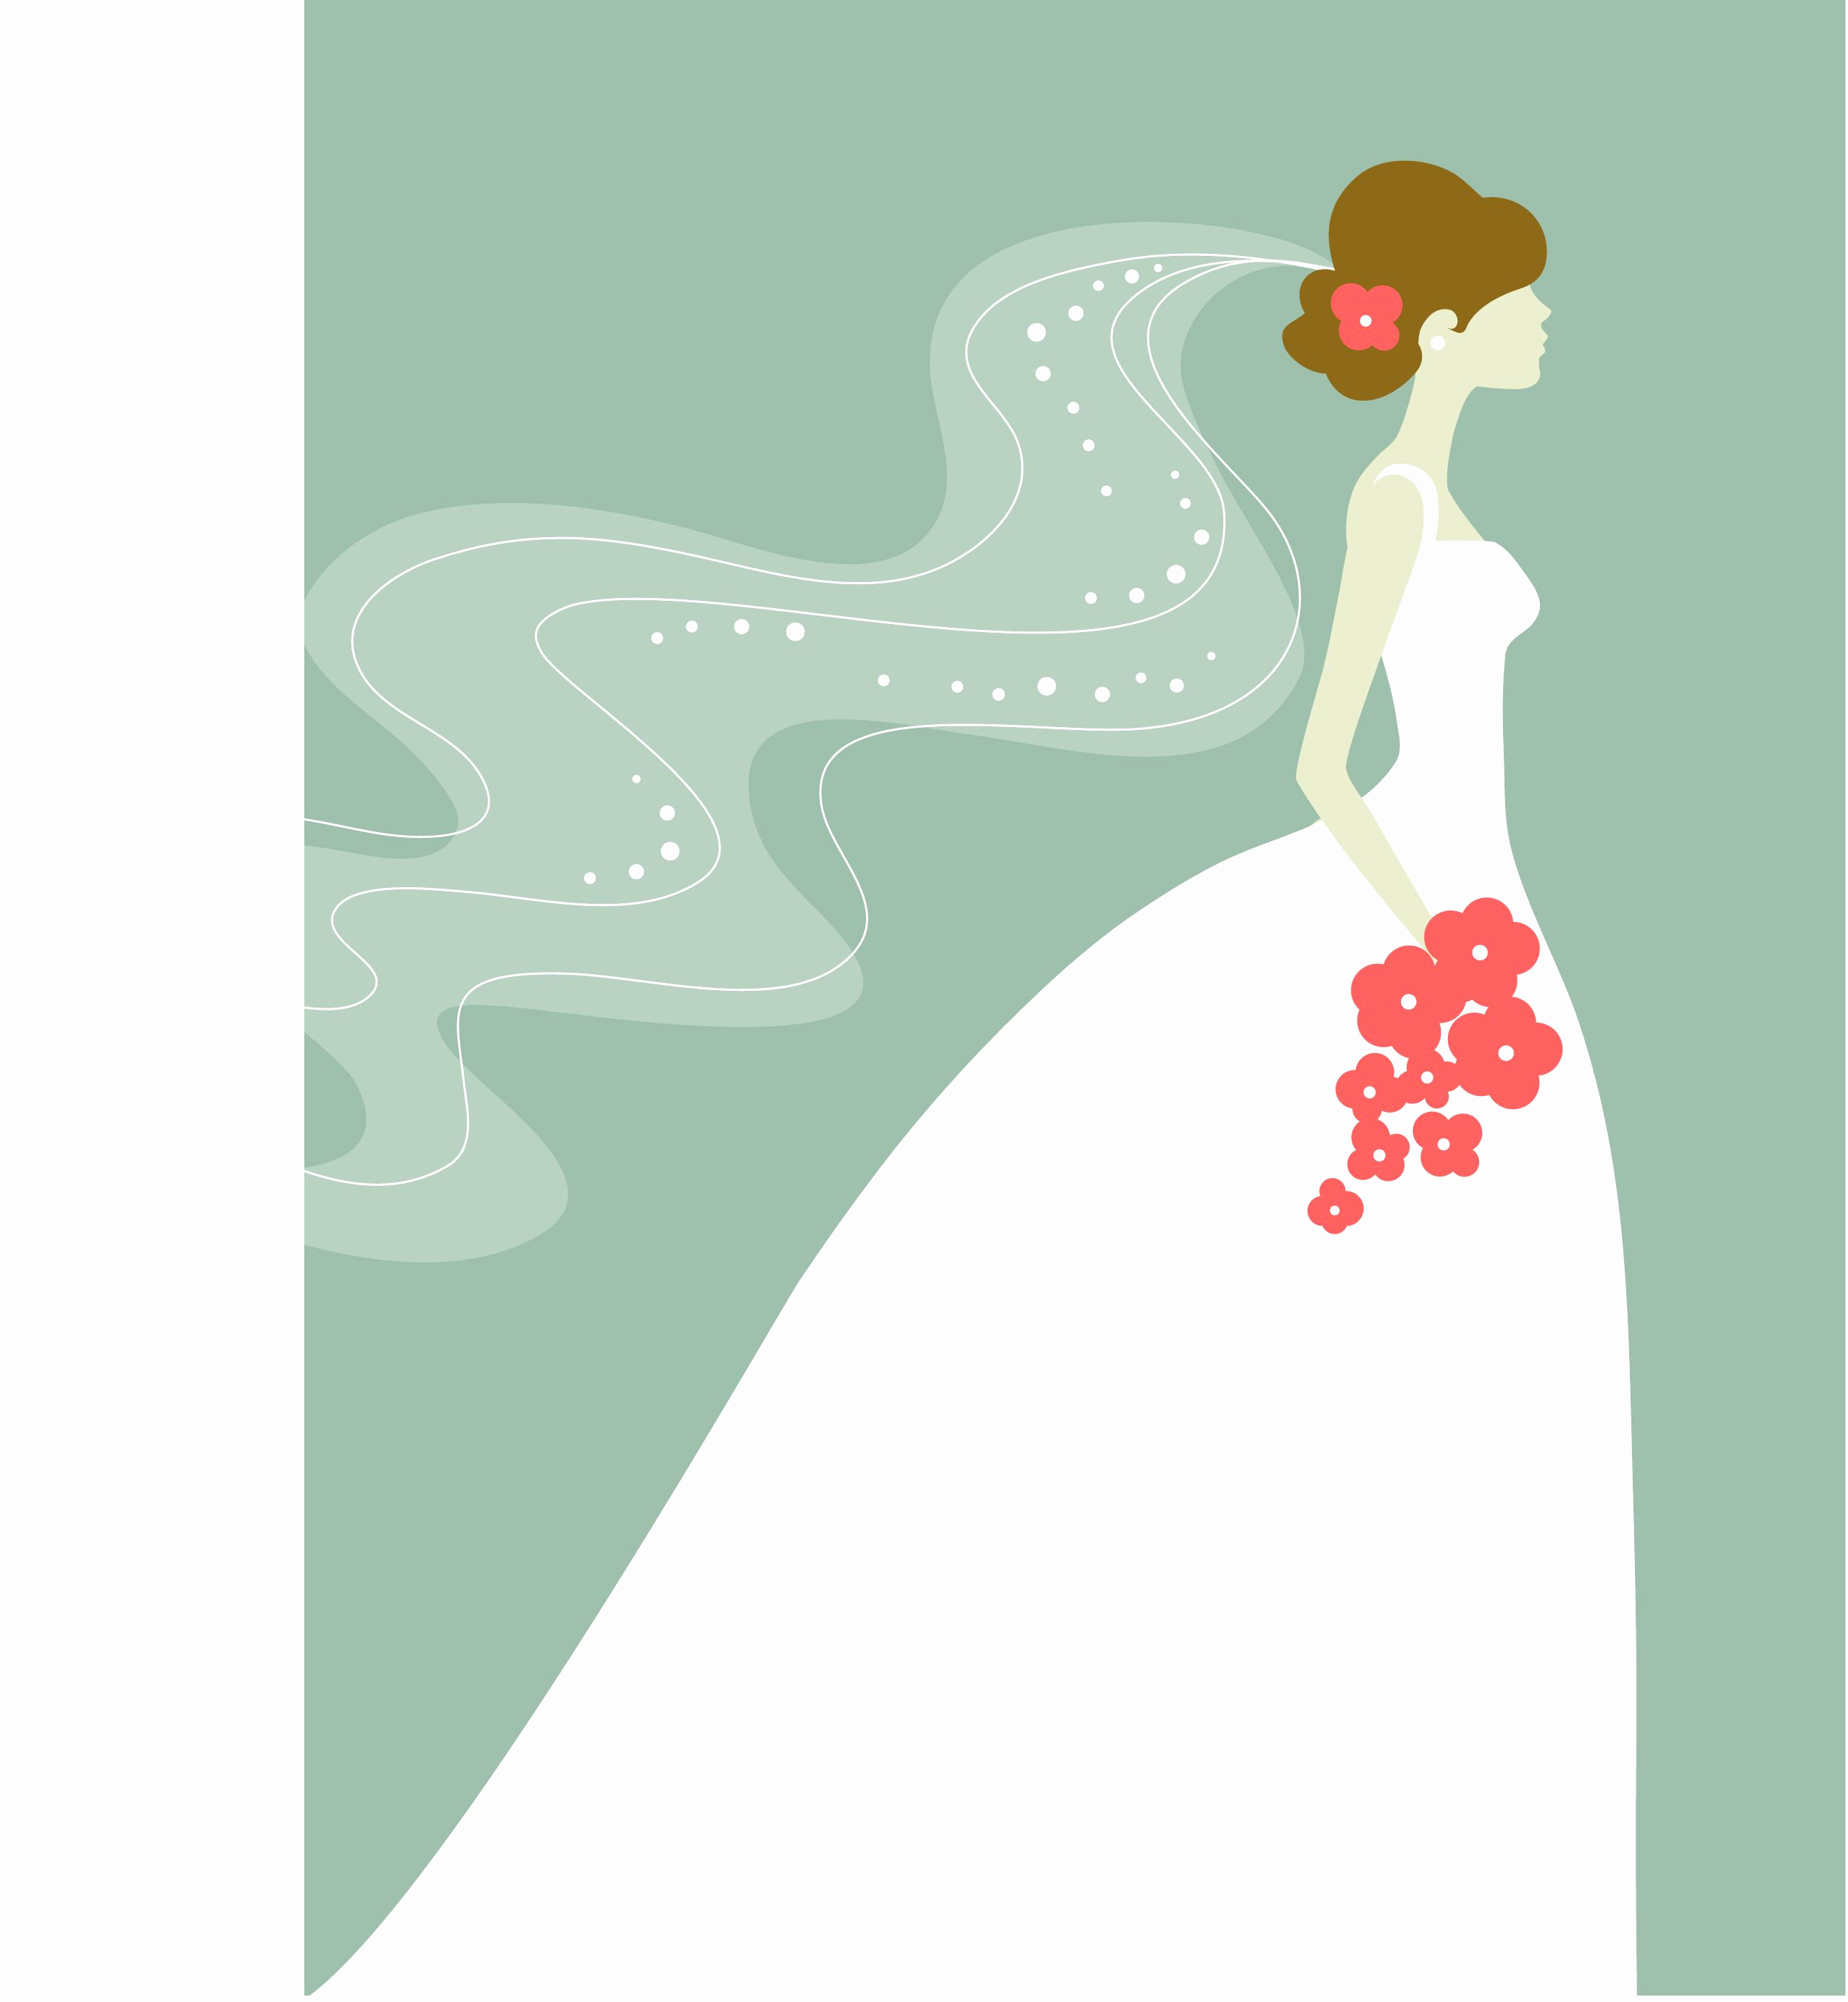 Free Bridal Shower Invitation Templates Elegant Bridal Shower Invitation Templates Bridal Shower